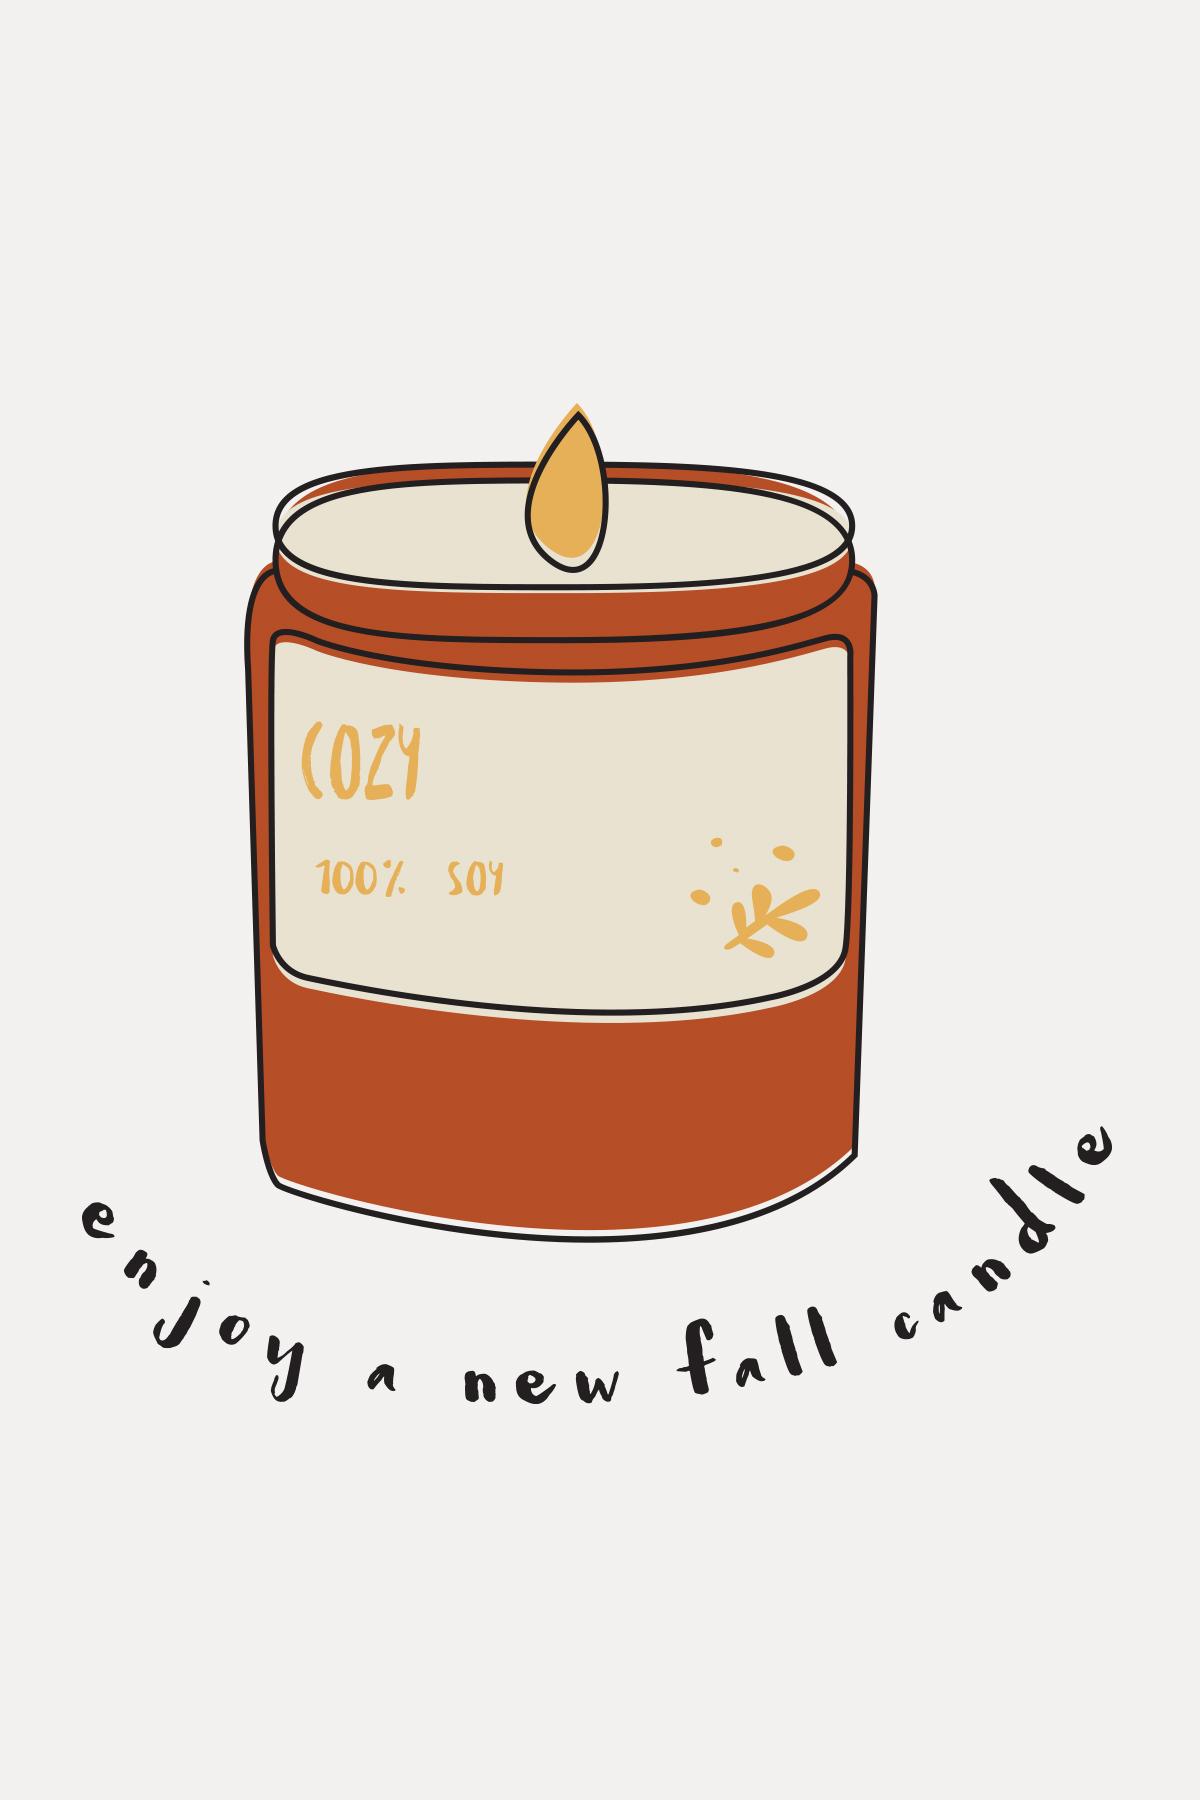 07_Fall_bucket_list_Blog_post_so_many_hoorays.jpg